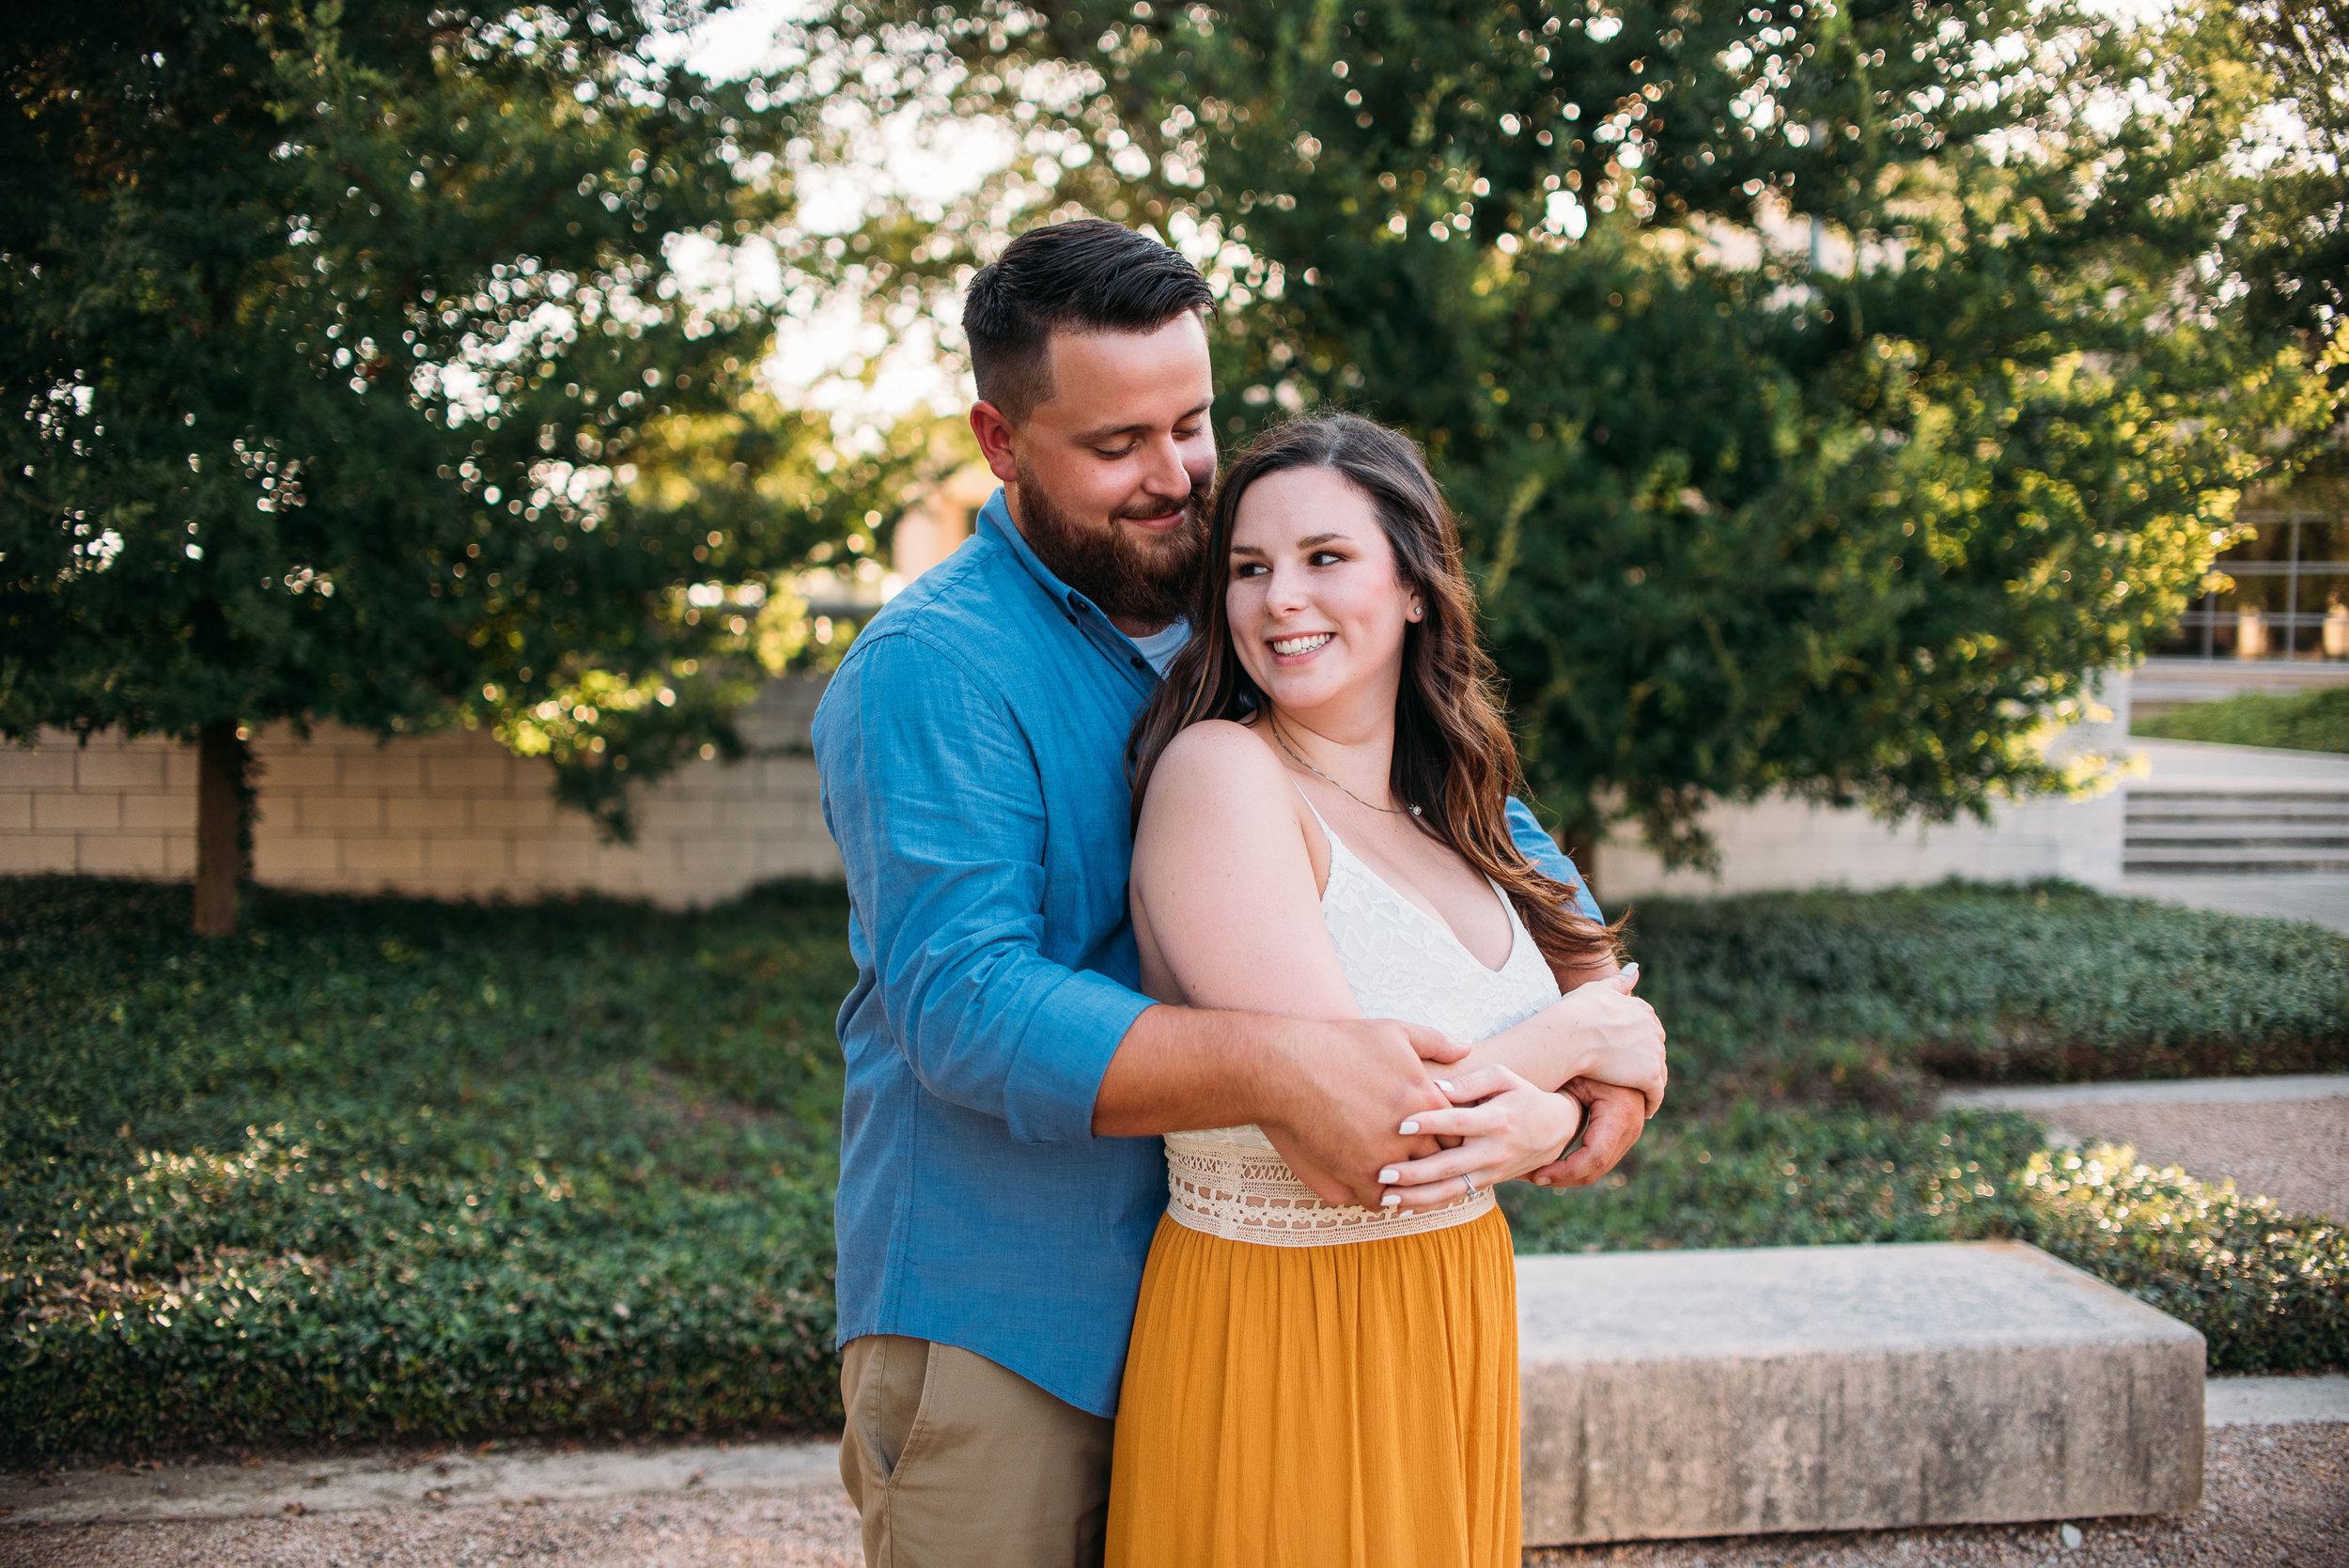 George-Bush-Library-Texas-A&M-University-Engagement-College-Station-Wedding-Photographer-San-Angel-Photo-Mark-Jenna-Matt-Century-Tree-01.jpg